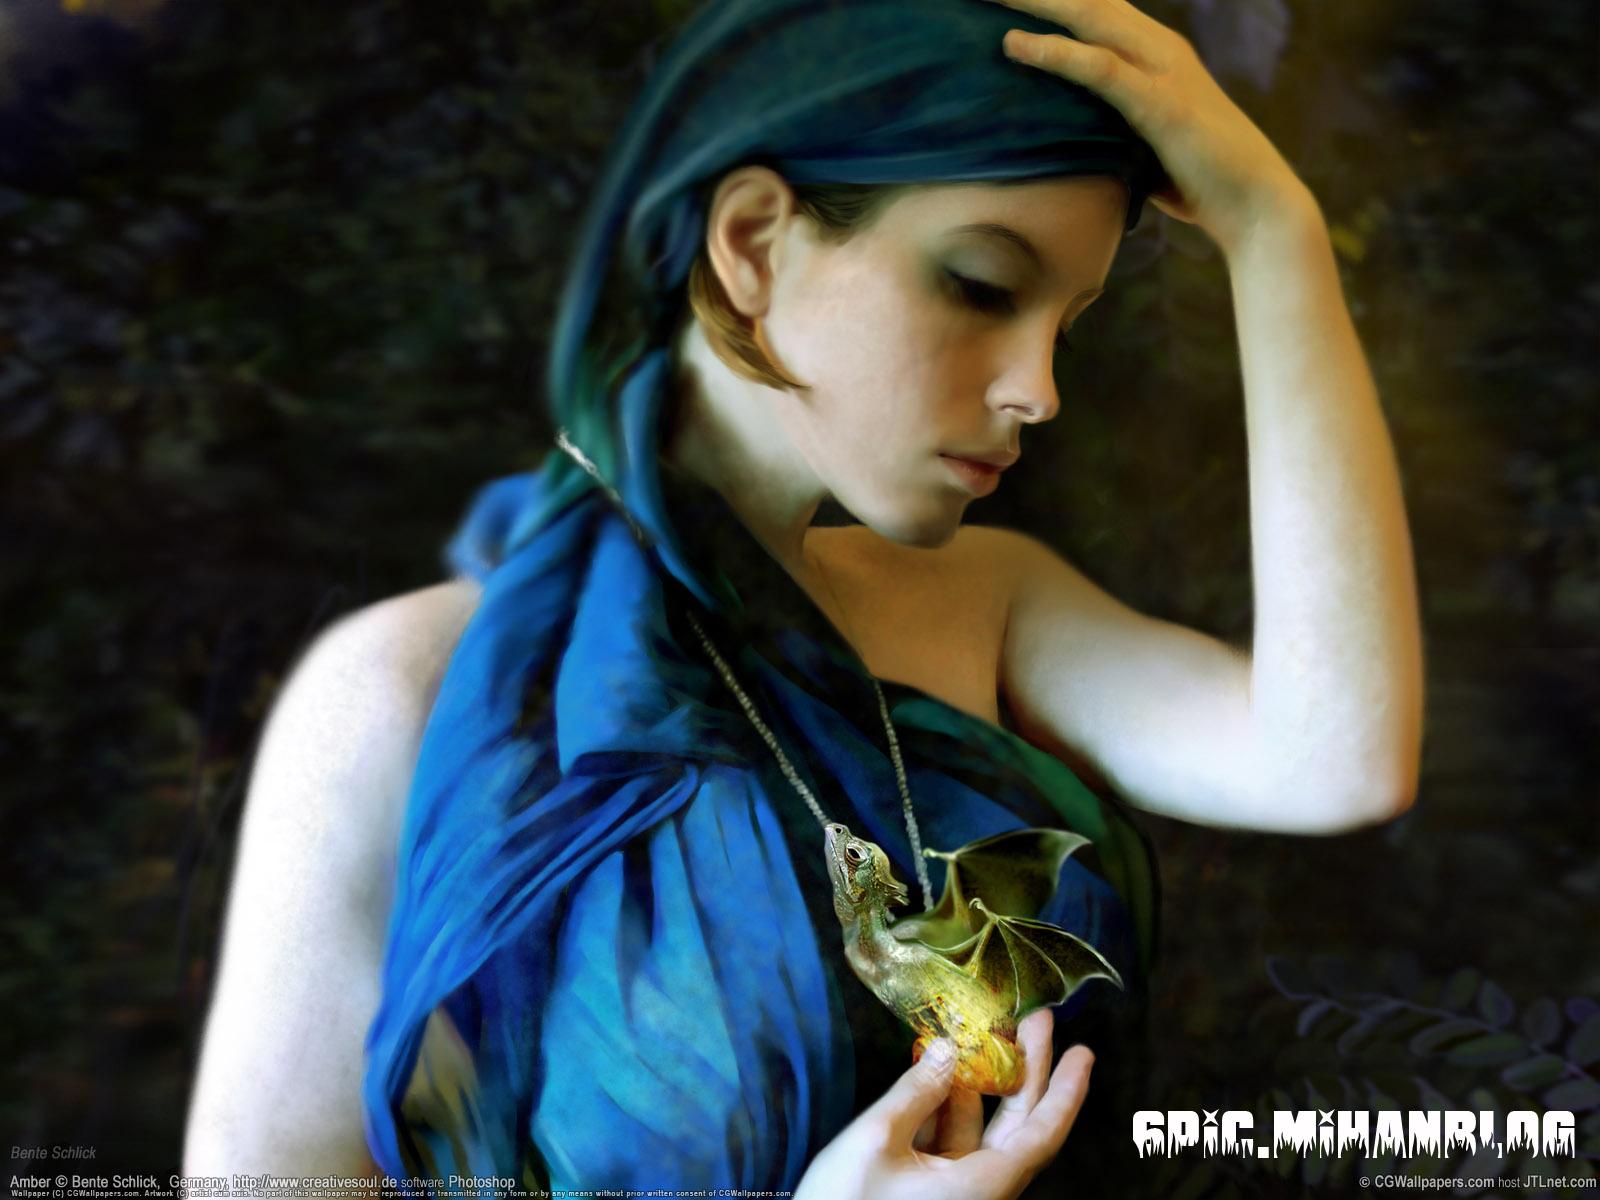 http://raziamoozesh.persiangig.com/(6pic.mihanblog.com)/1%20%2816%29.jpg